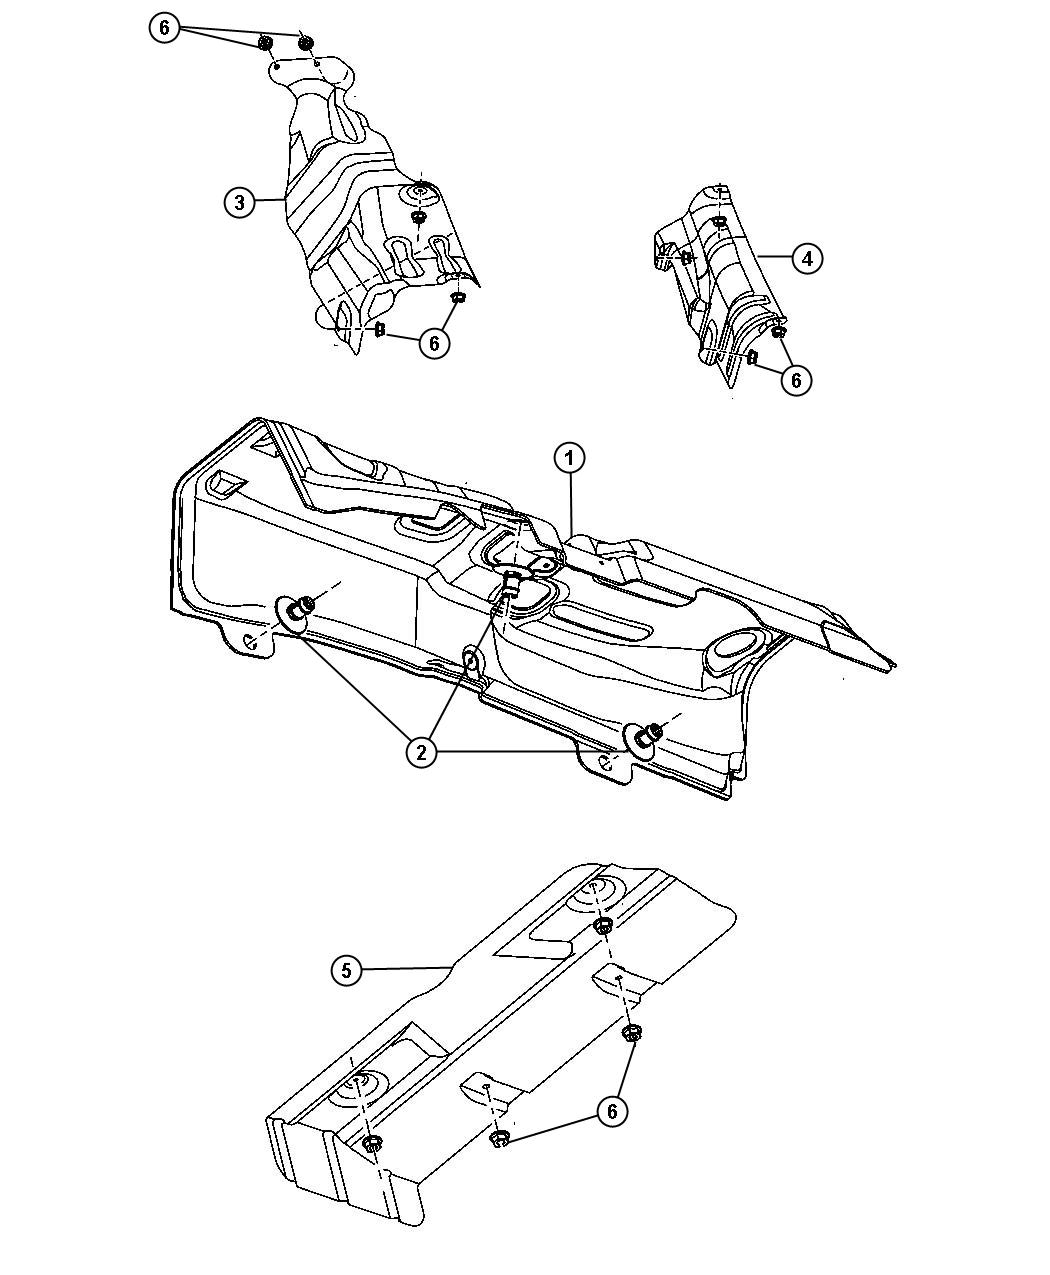 Jeep Patriot Shield. Floor pan, heat. Muffler, rear, rear